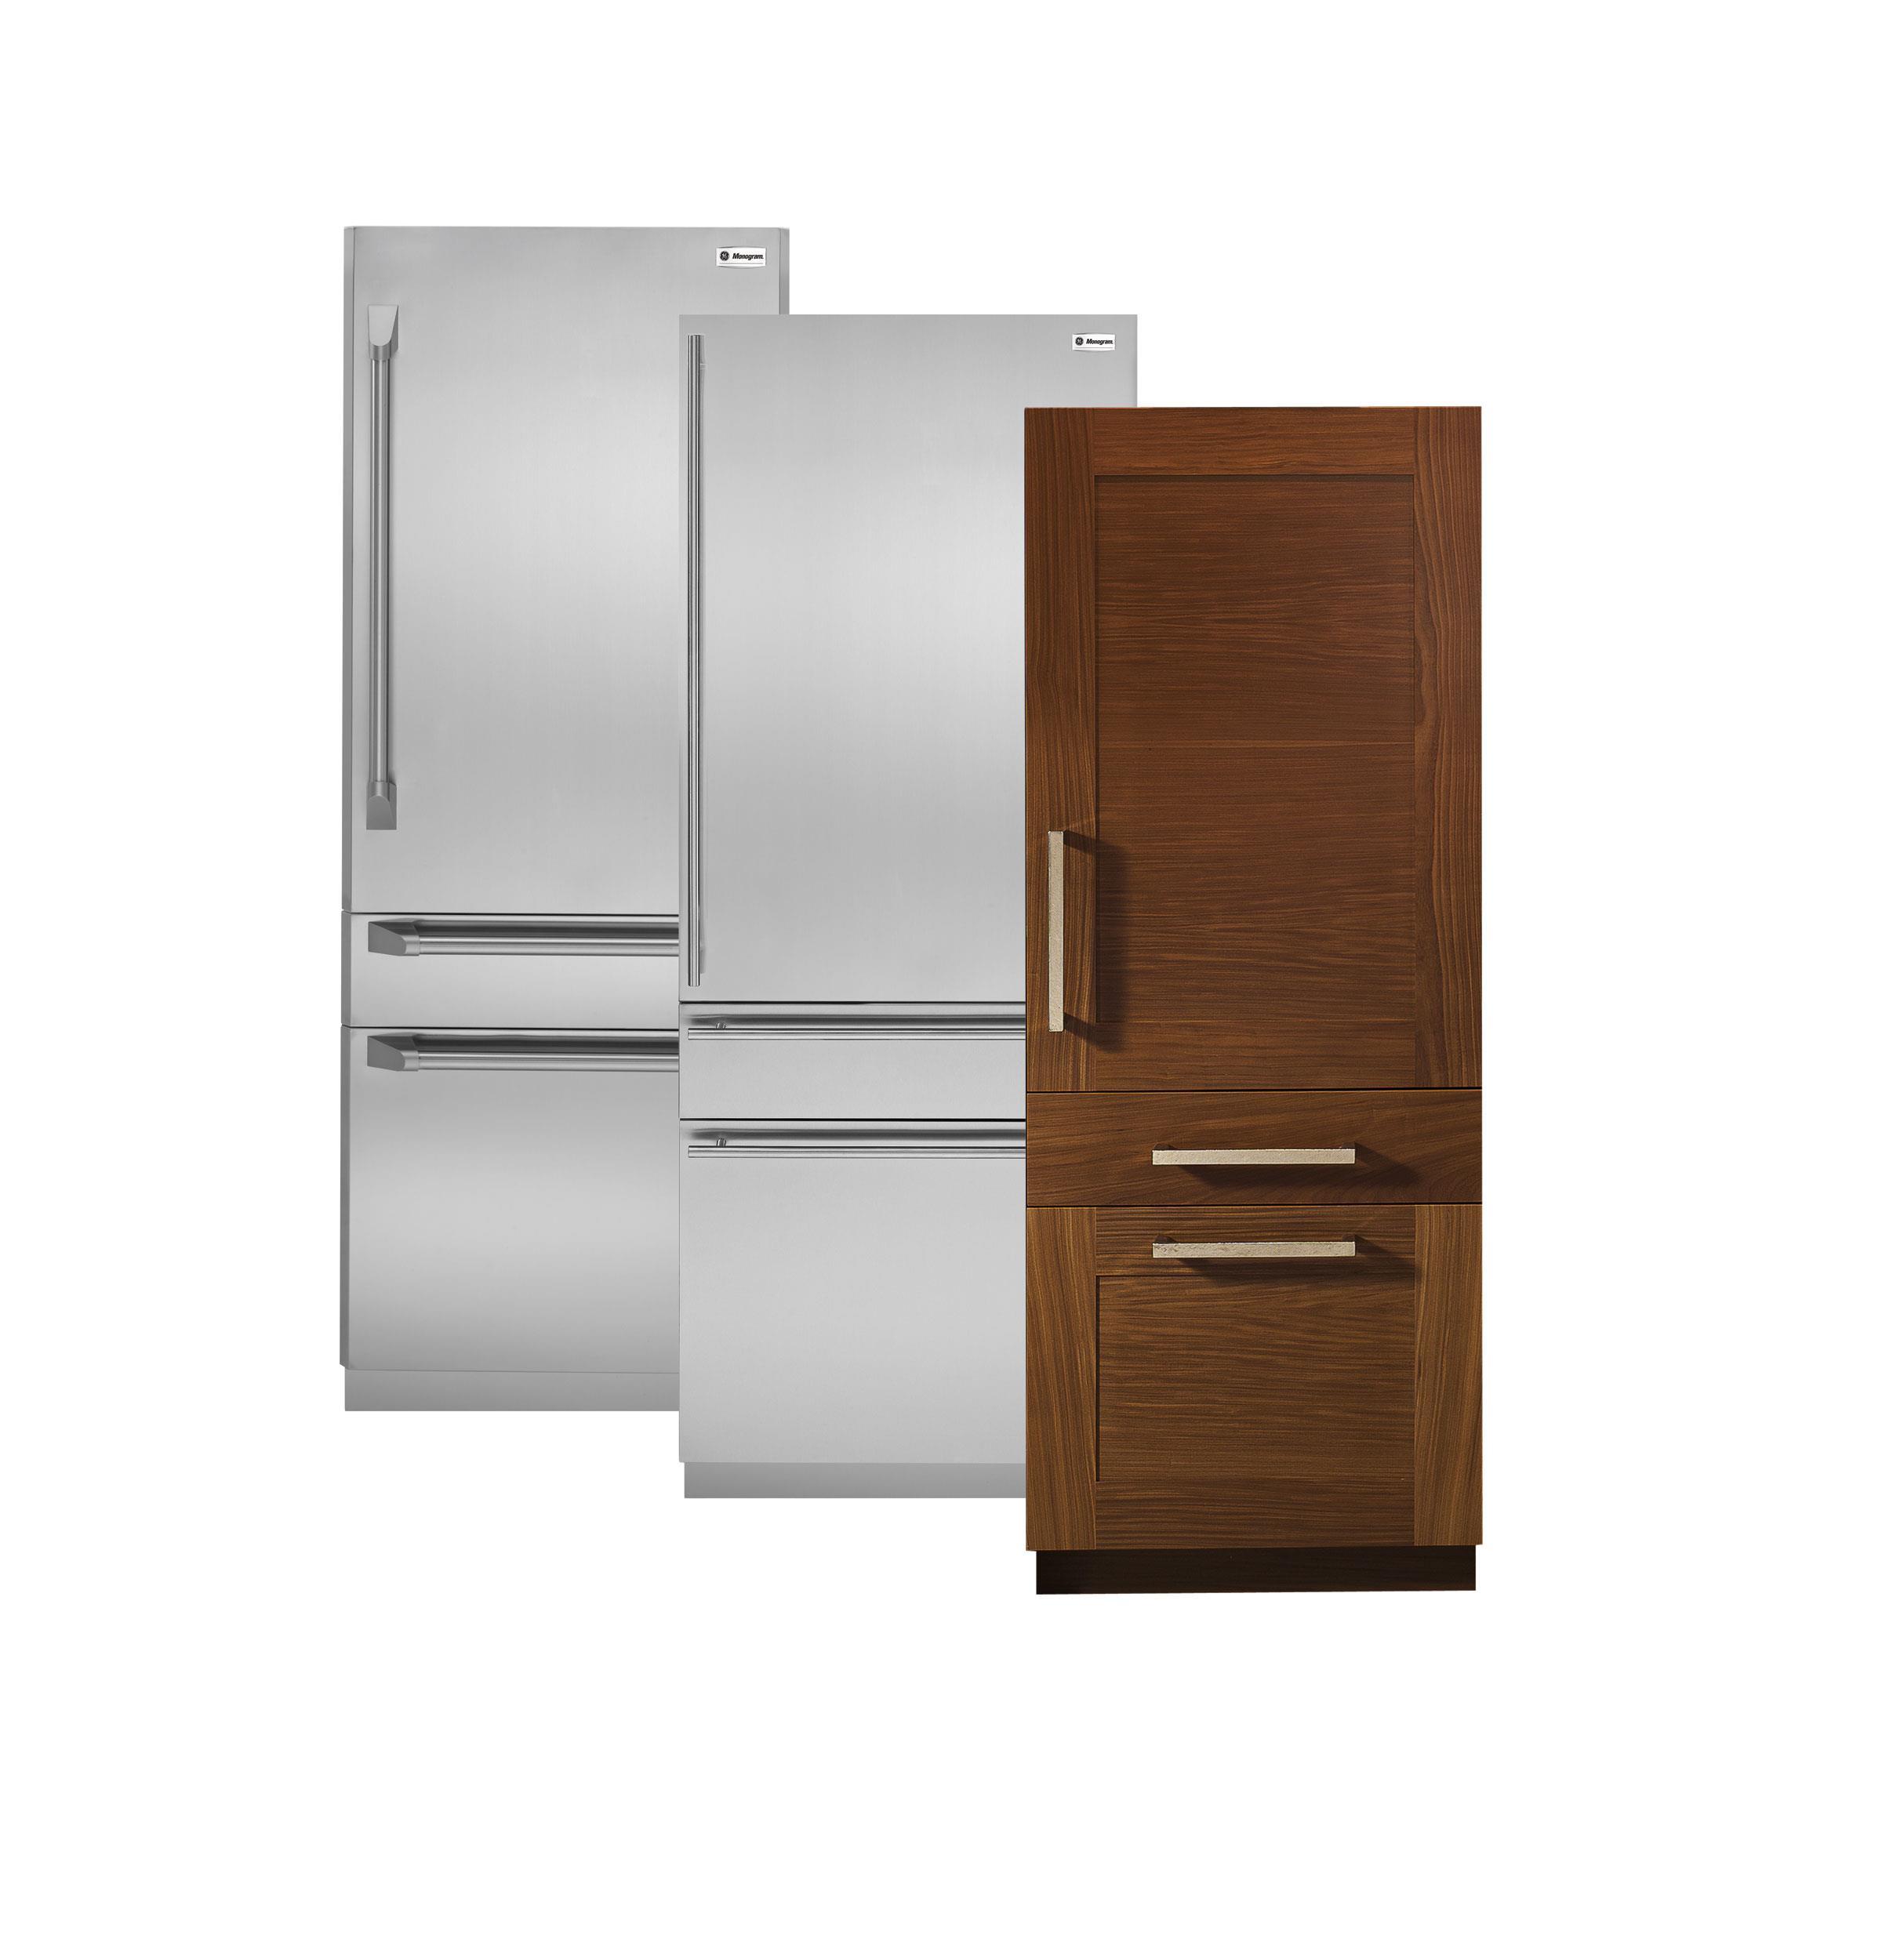 "14.09 cu ft. 30"" Bottom Freezer Refrigerator"